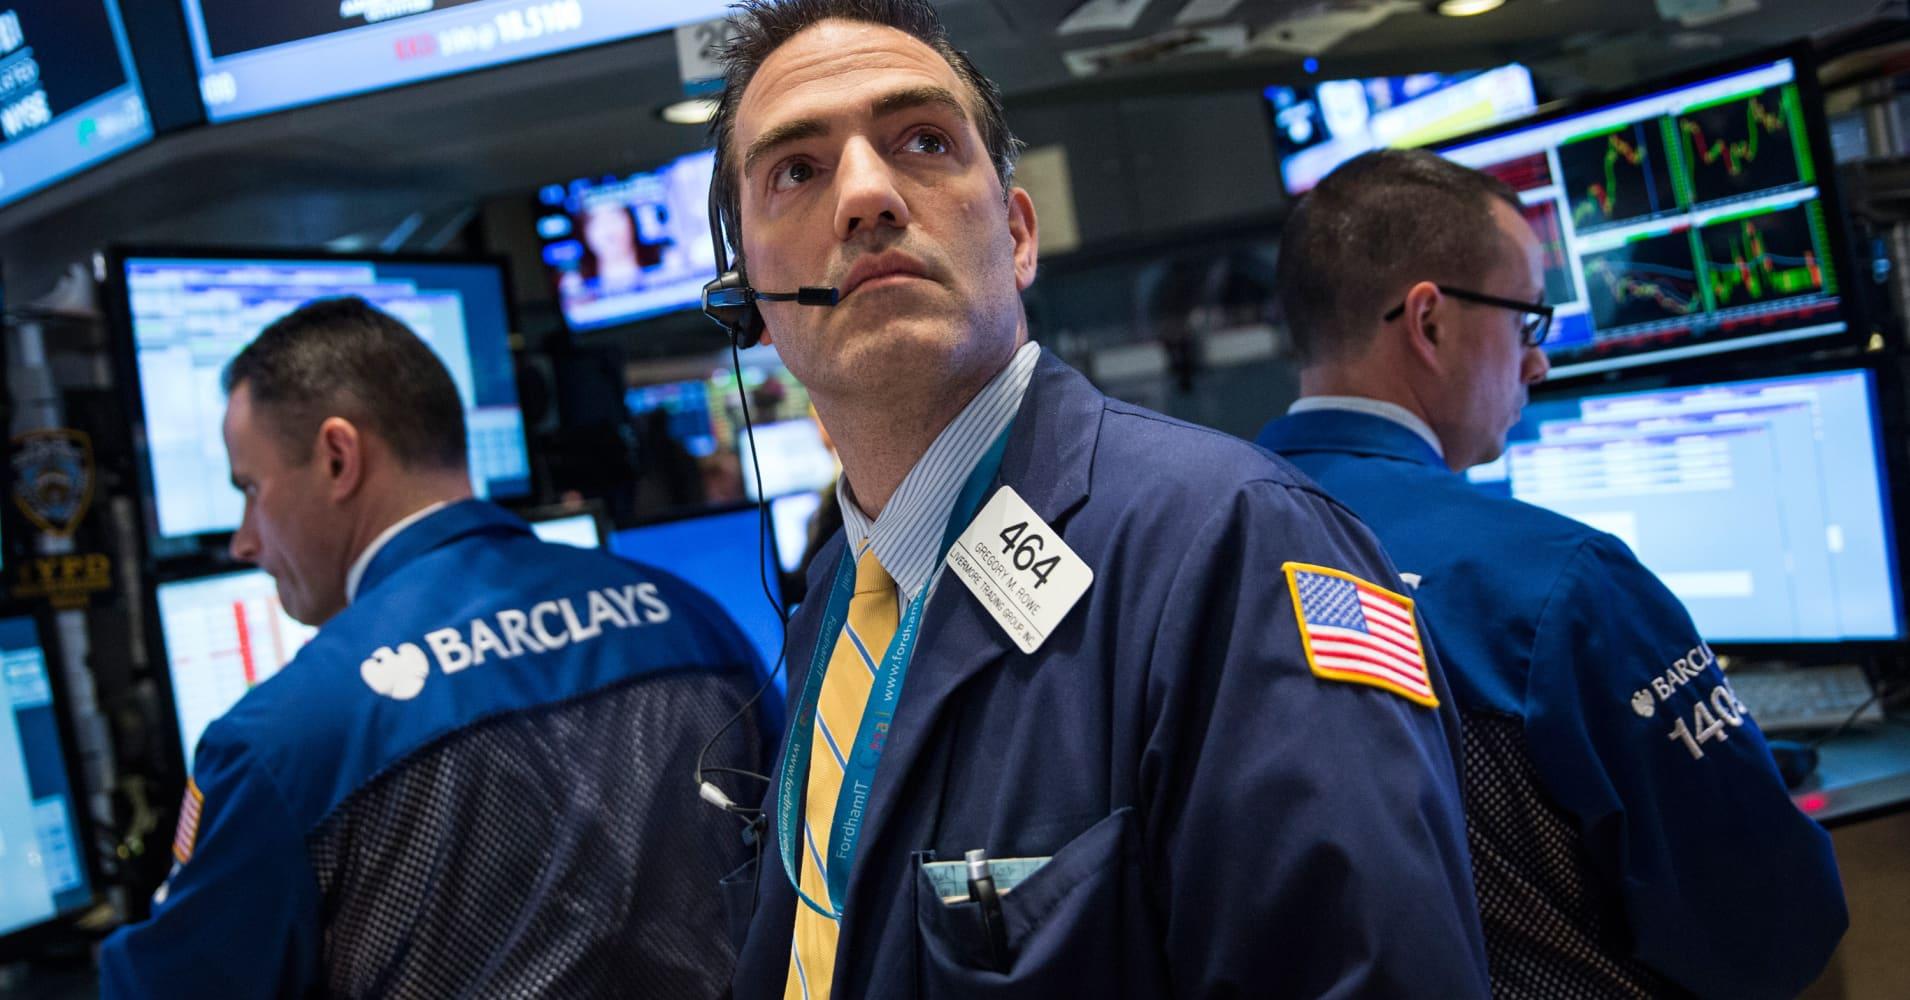 Santoli: These 3 big investor worries seem way overblown